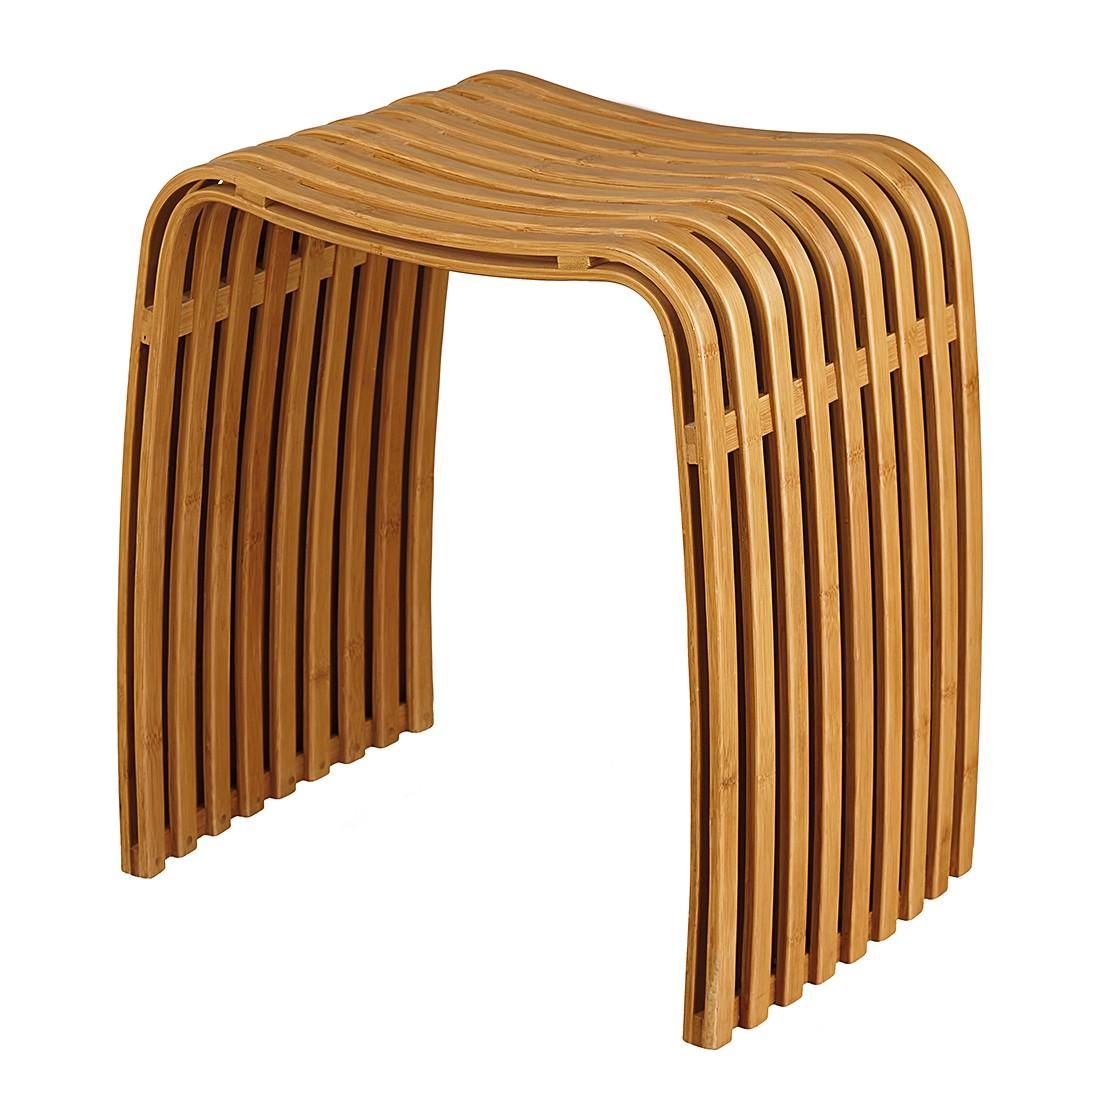 nicol wohnausstattungen tabouret fabian bambou prix et meilleures offres. Black Bedroom Furniture Sets. Home Design Ideas